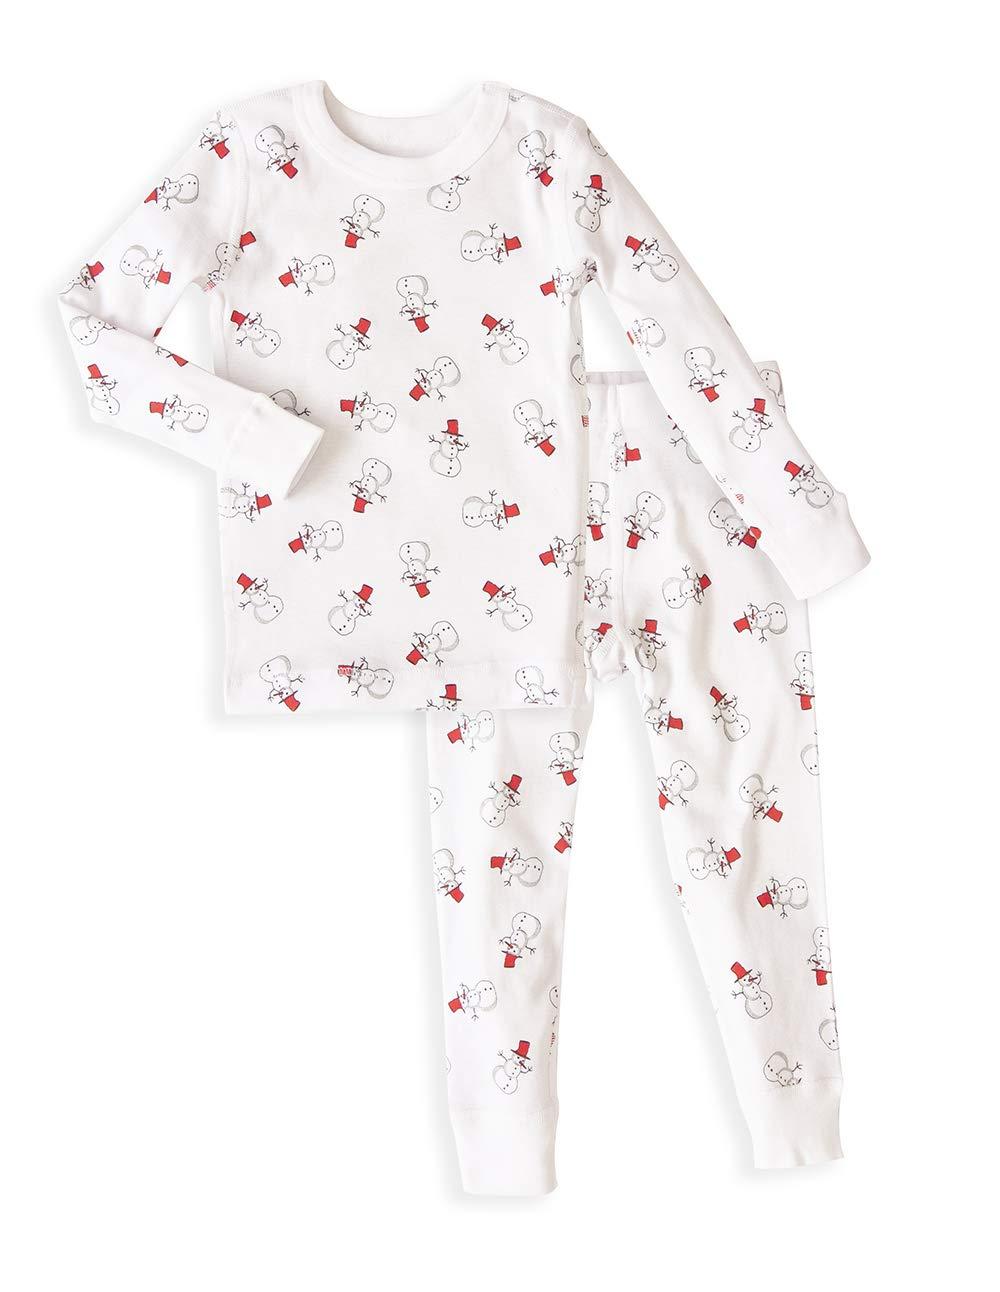 Skylar Luna Unisex Long Sleeve Pajamas Set- 100% Organic Cotton Snowmen Size 7